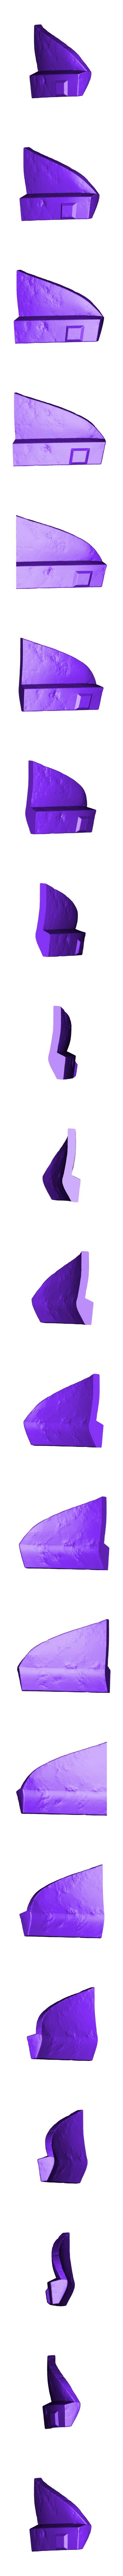 Armory_Damaged_Print22.obj Download OBJ file Armory - Knights of Ren Helmet (damaged), 3D print model • 3D print design, 3D-mon